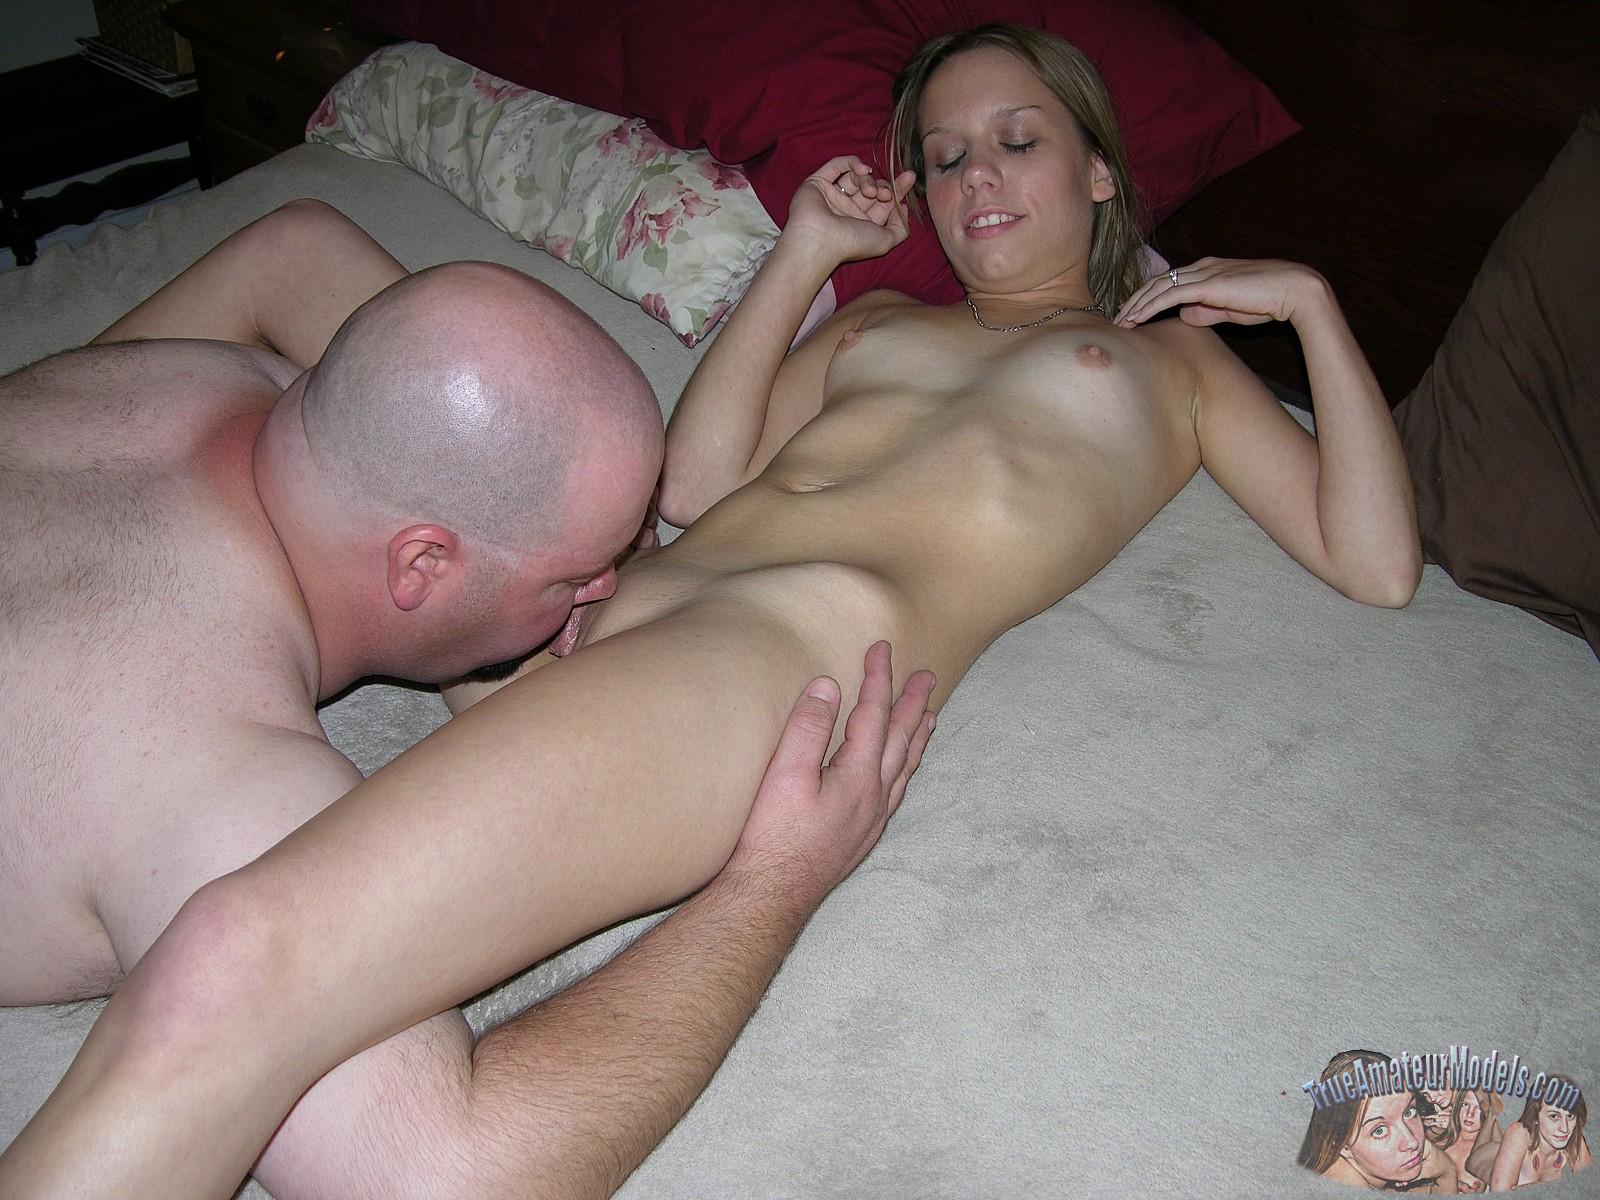 Sexy squirting women gif